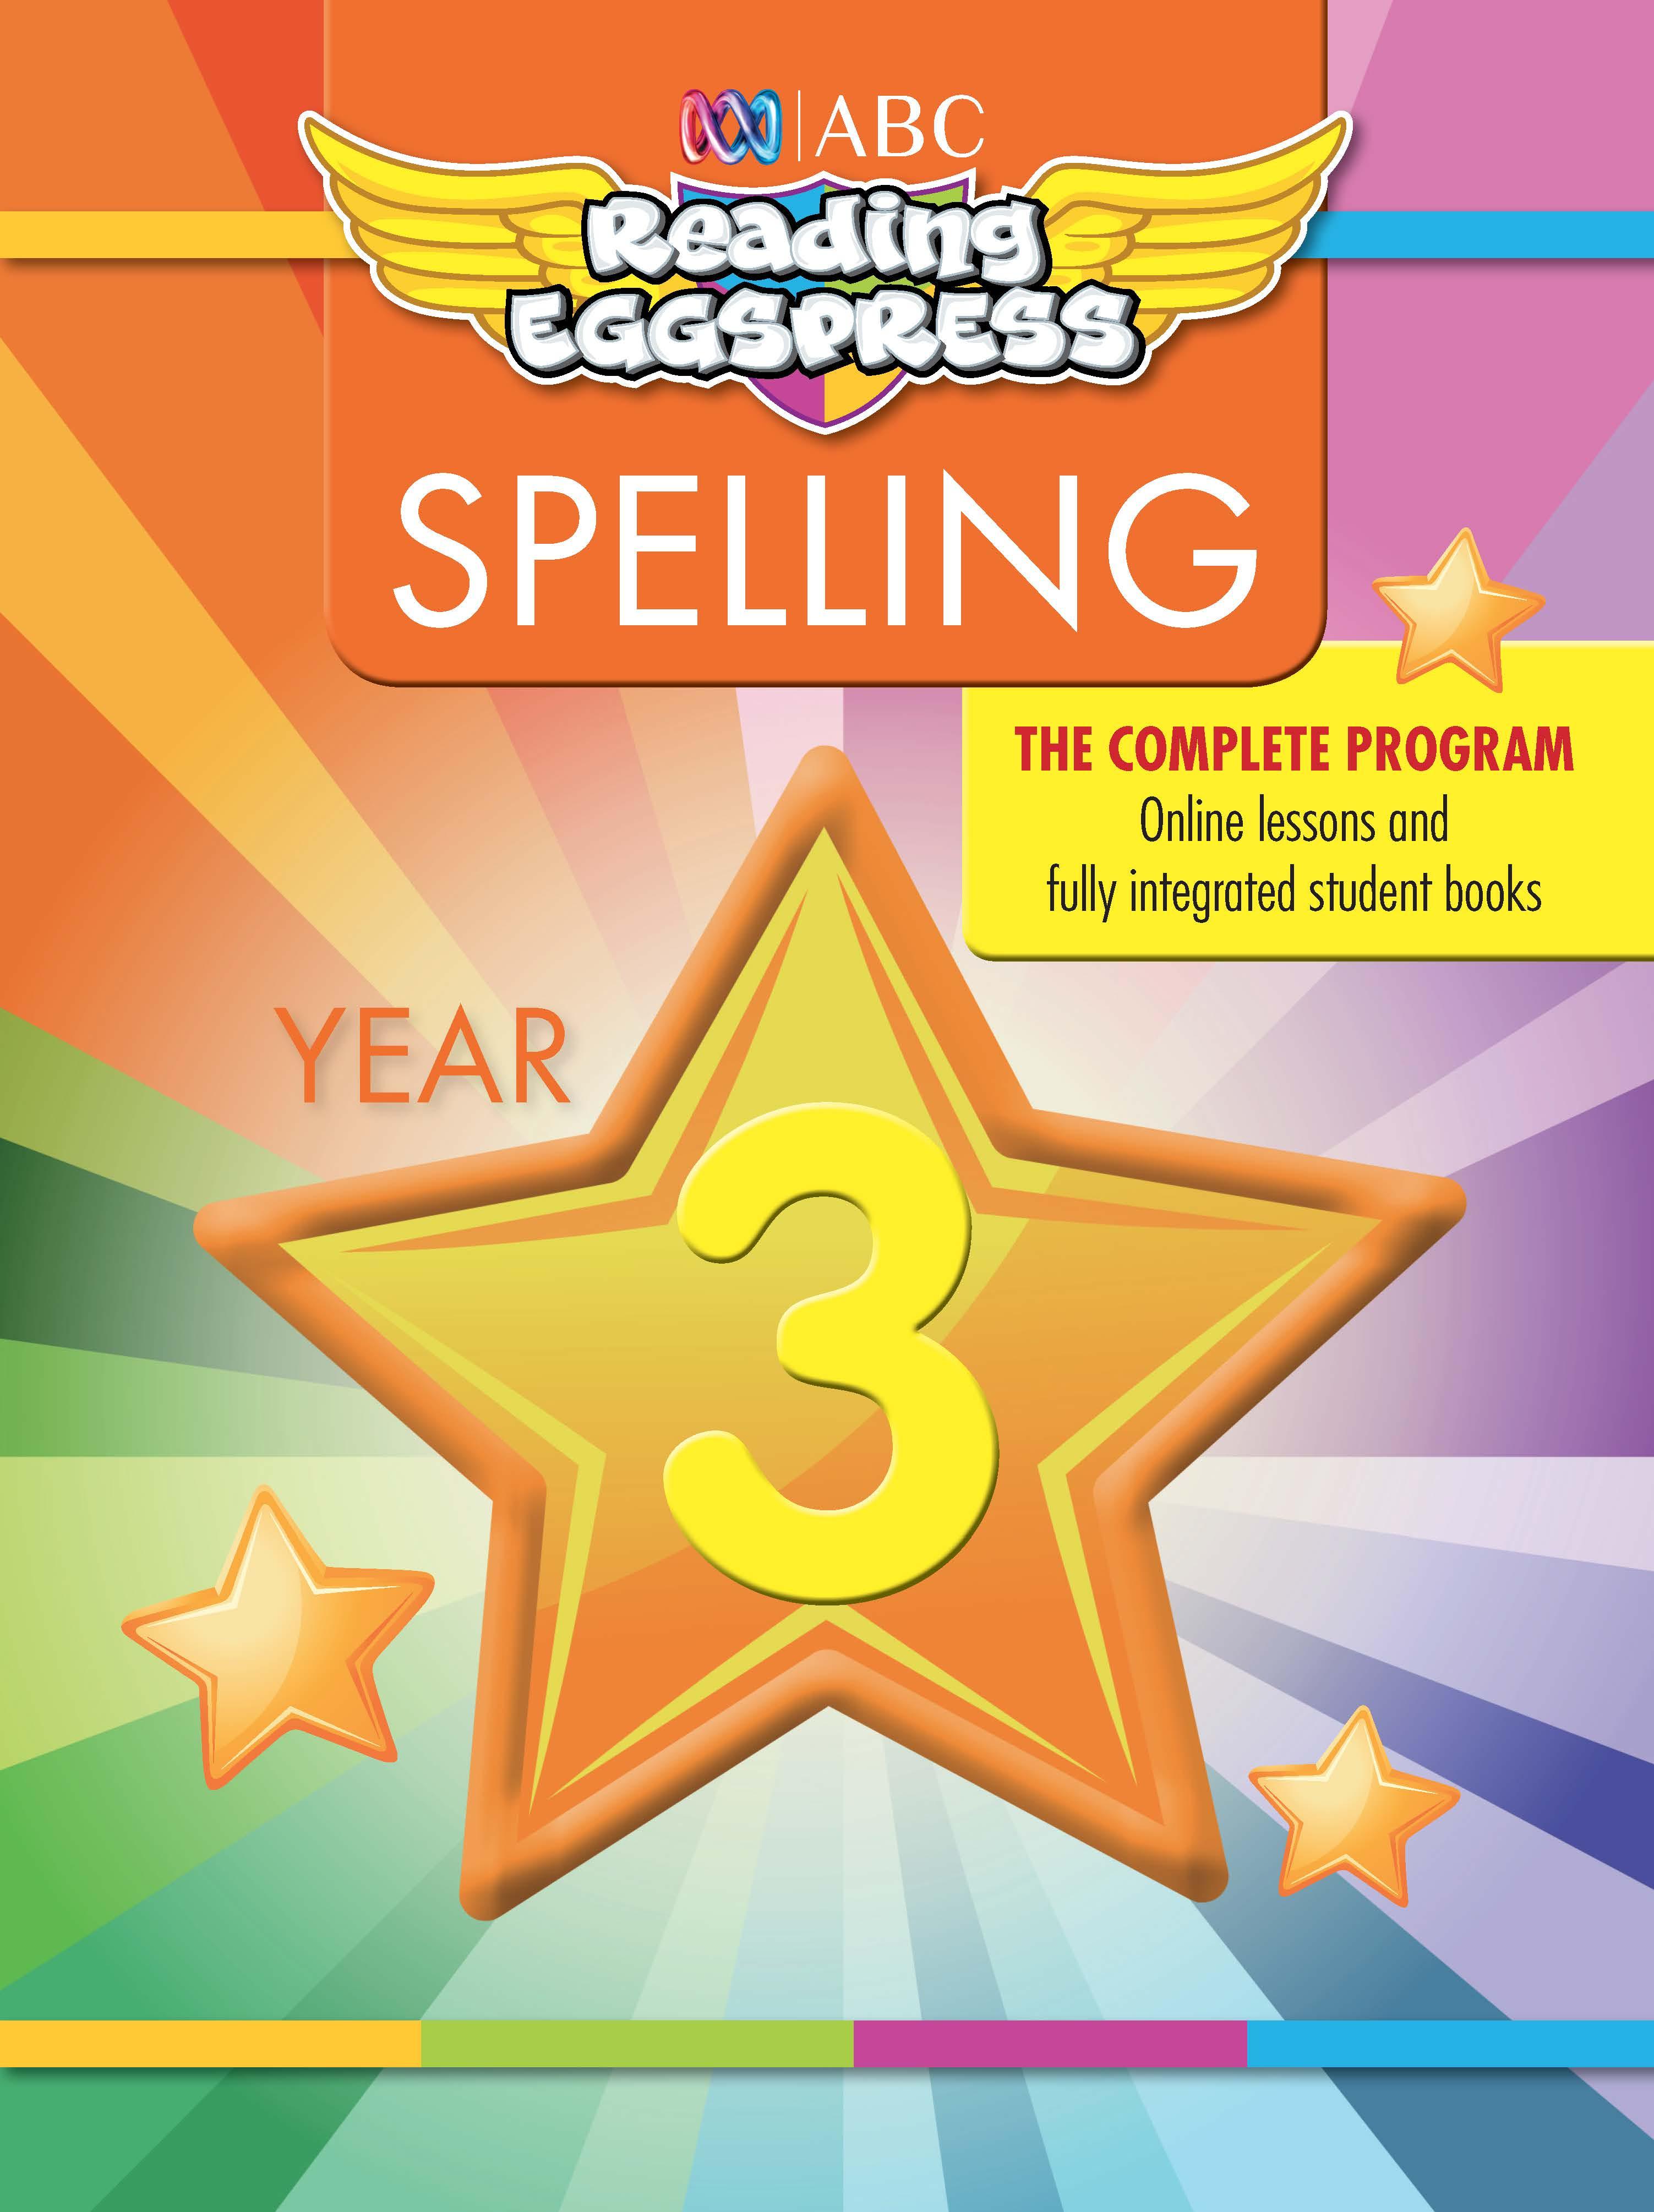 ABC Reading Eggspress Spelling Workbook Year 3